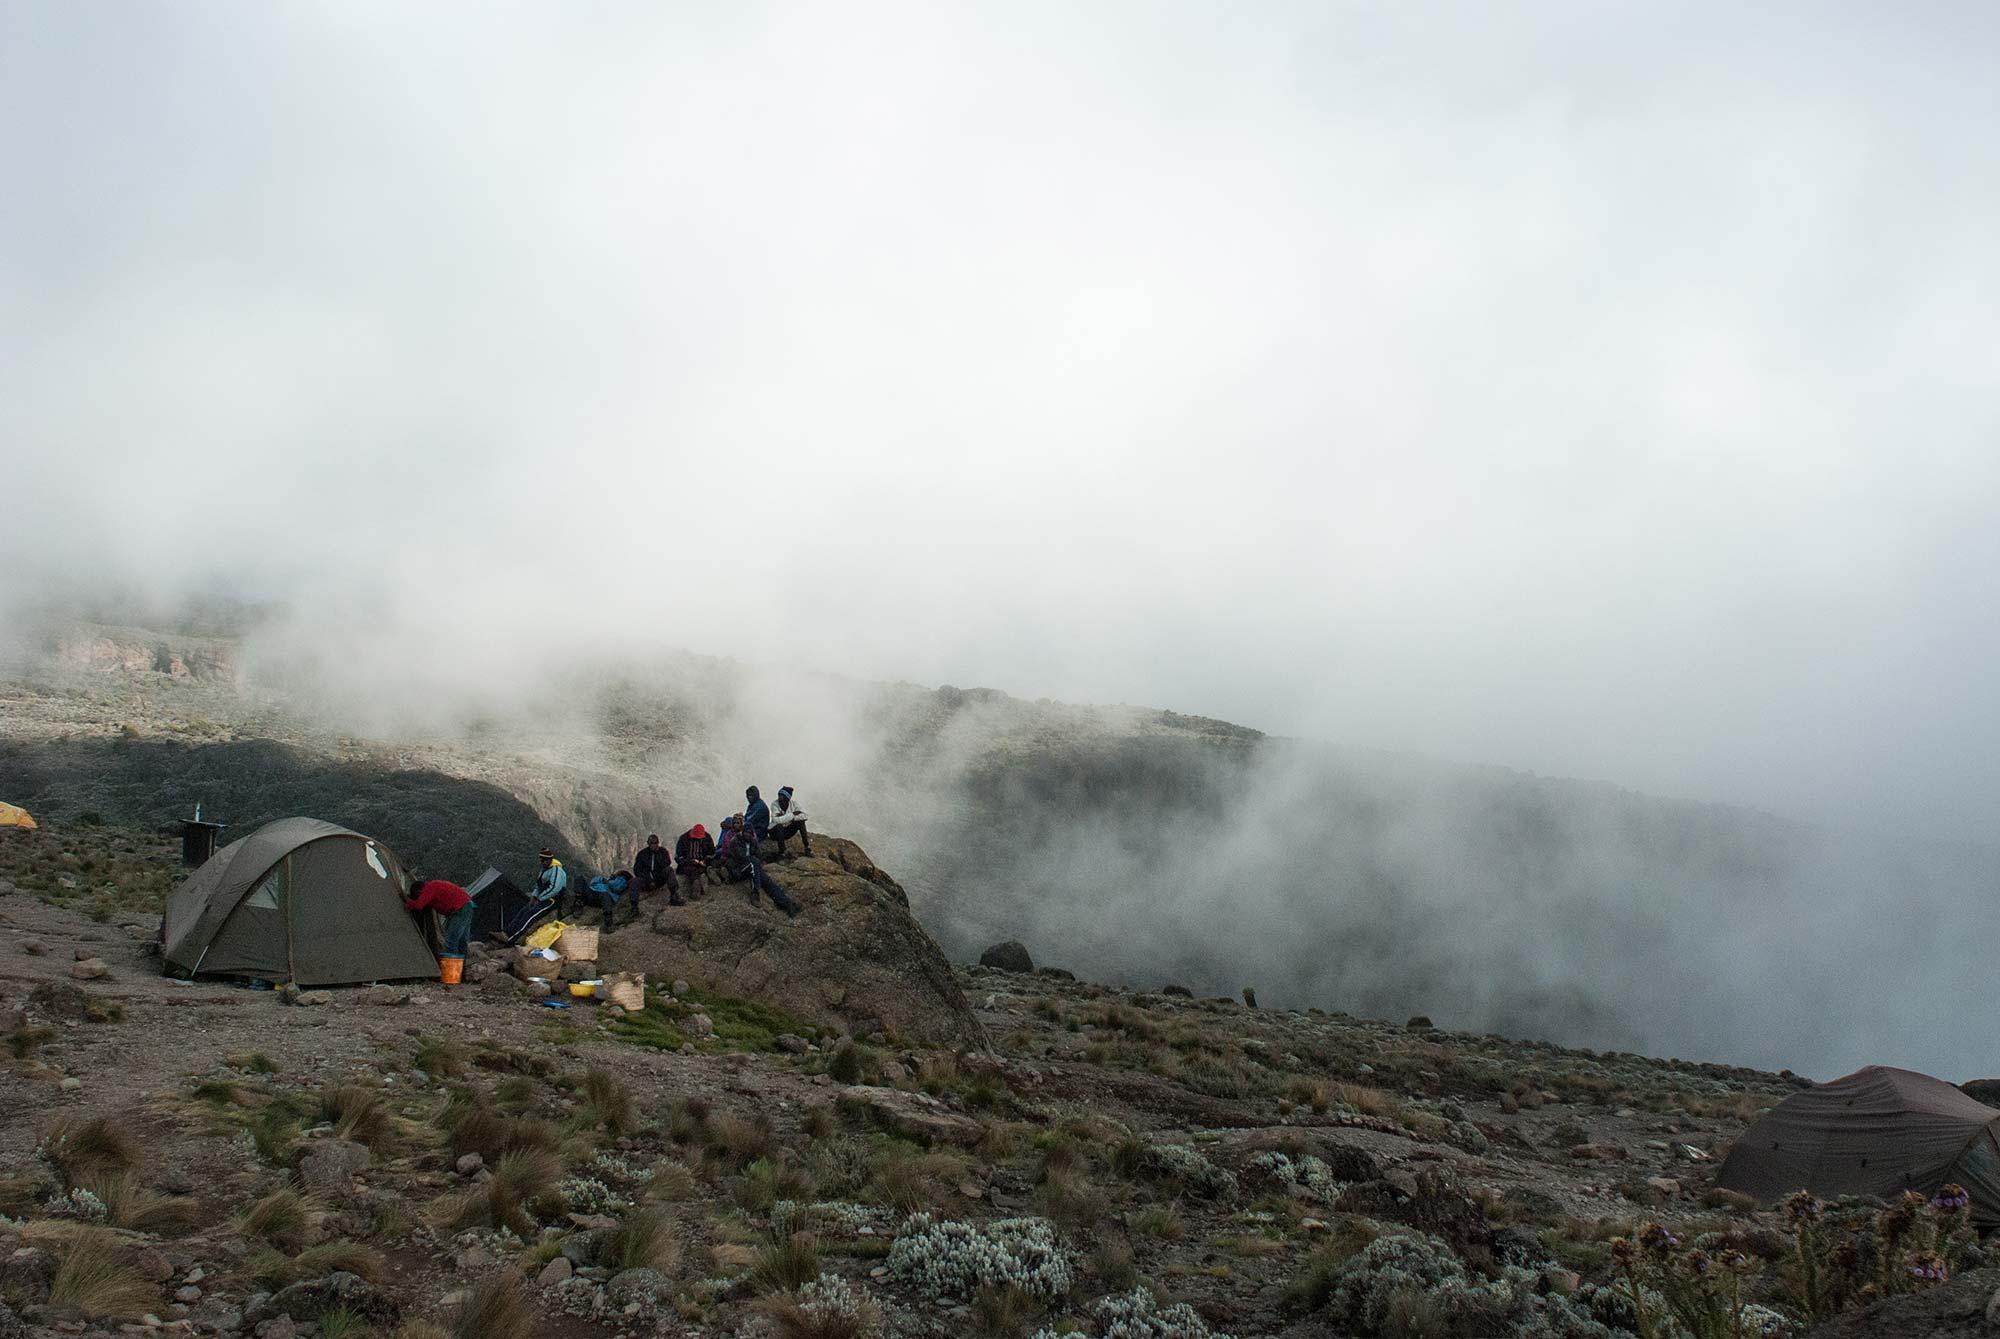 D5-16-porters-listening-to-soccer-on-a-rock-karanga-camp-kilimanjaro.jpg